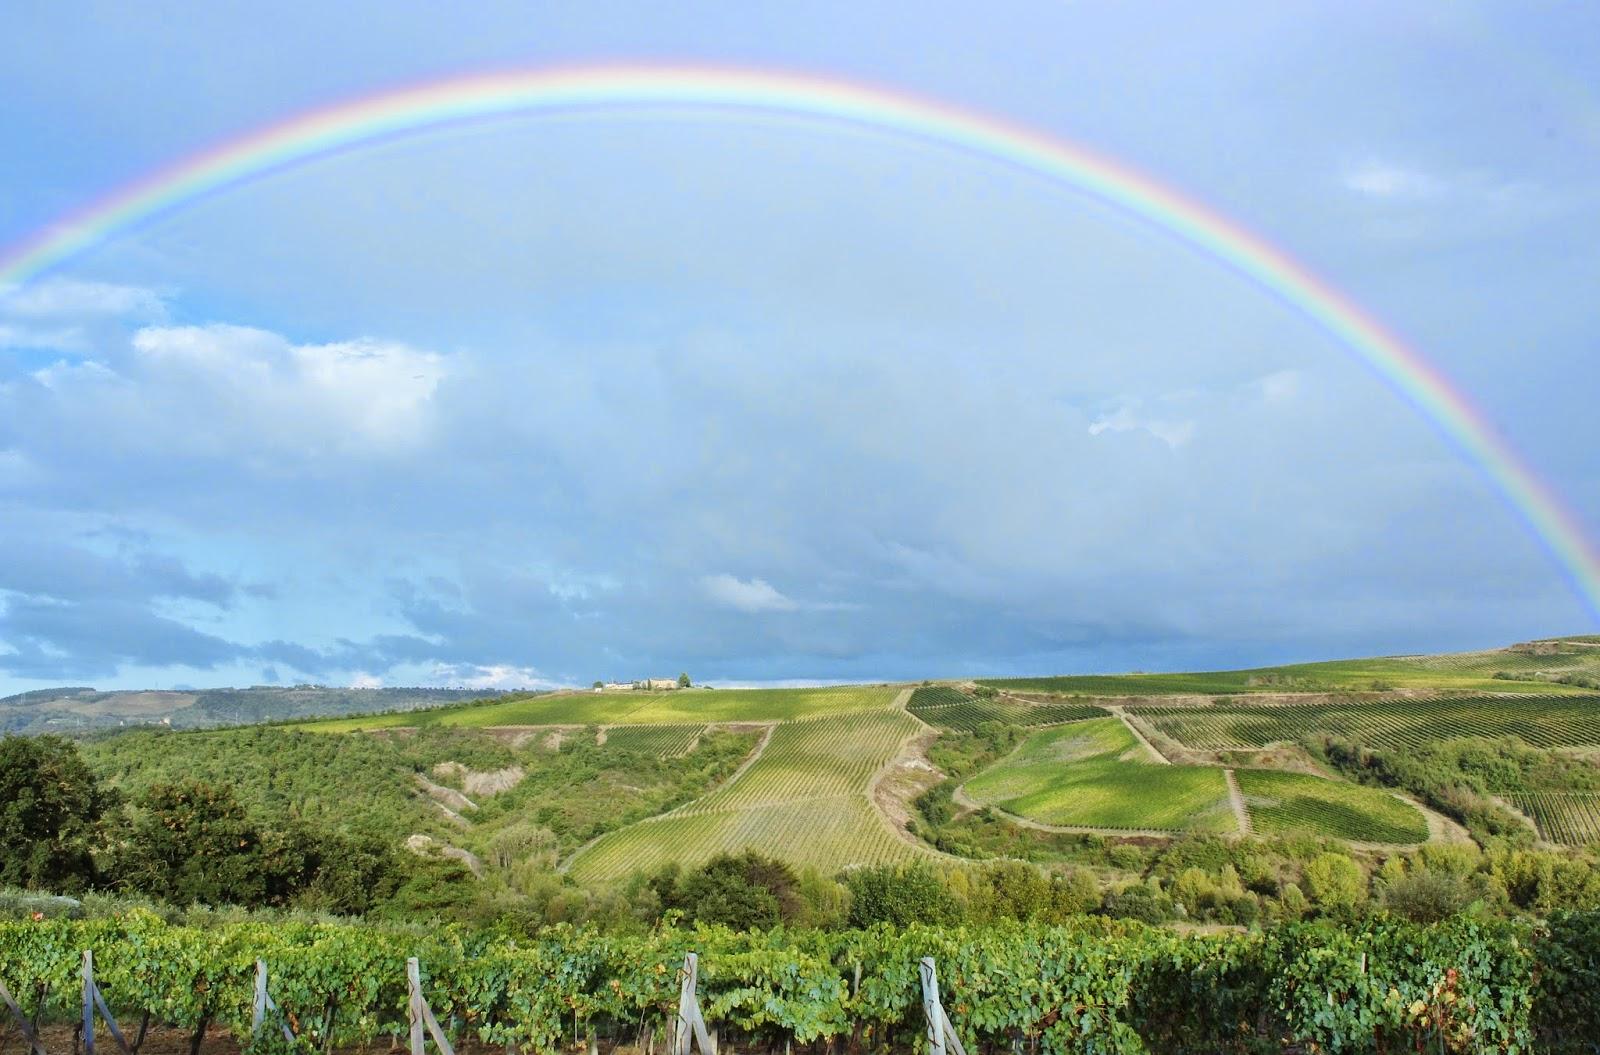 rainbow over vineyards in Orvieto Italy